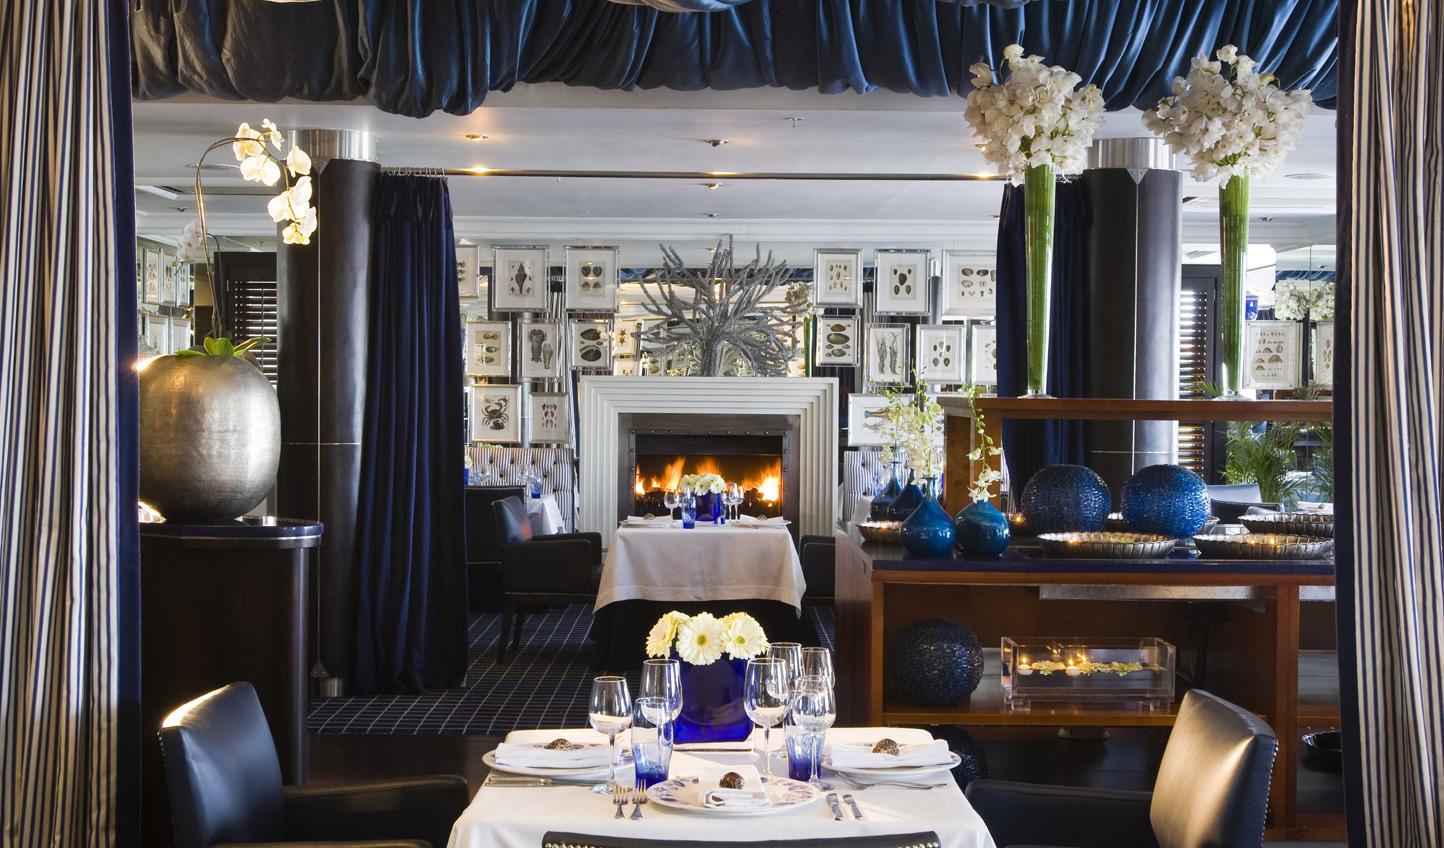 Dine at South Africa's award-winning restaurant 'Azure'